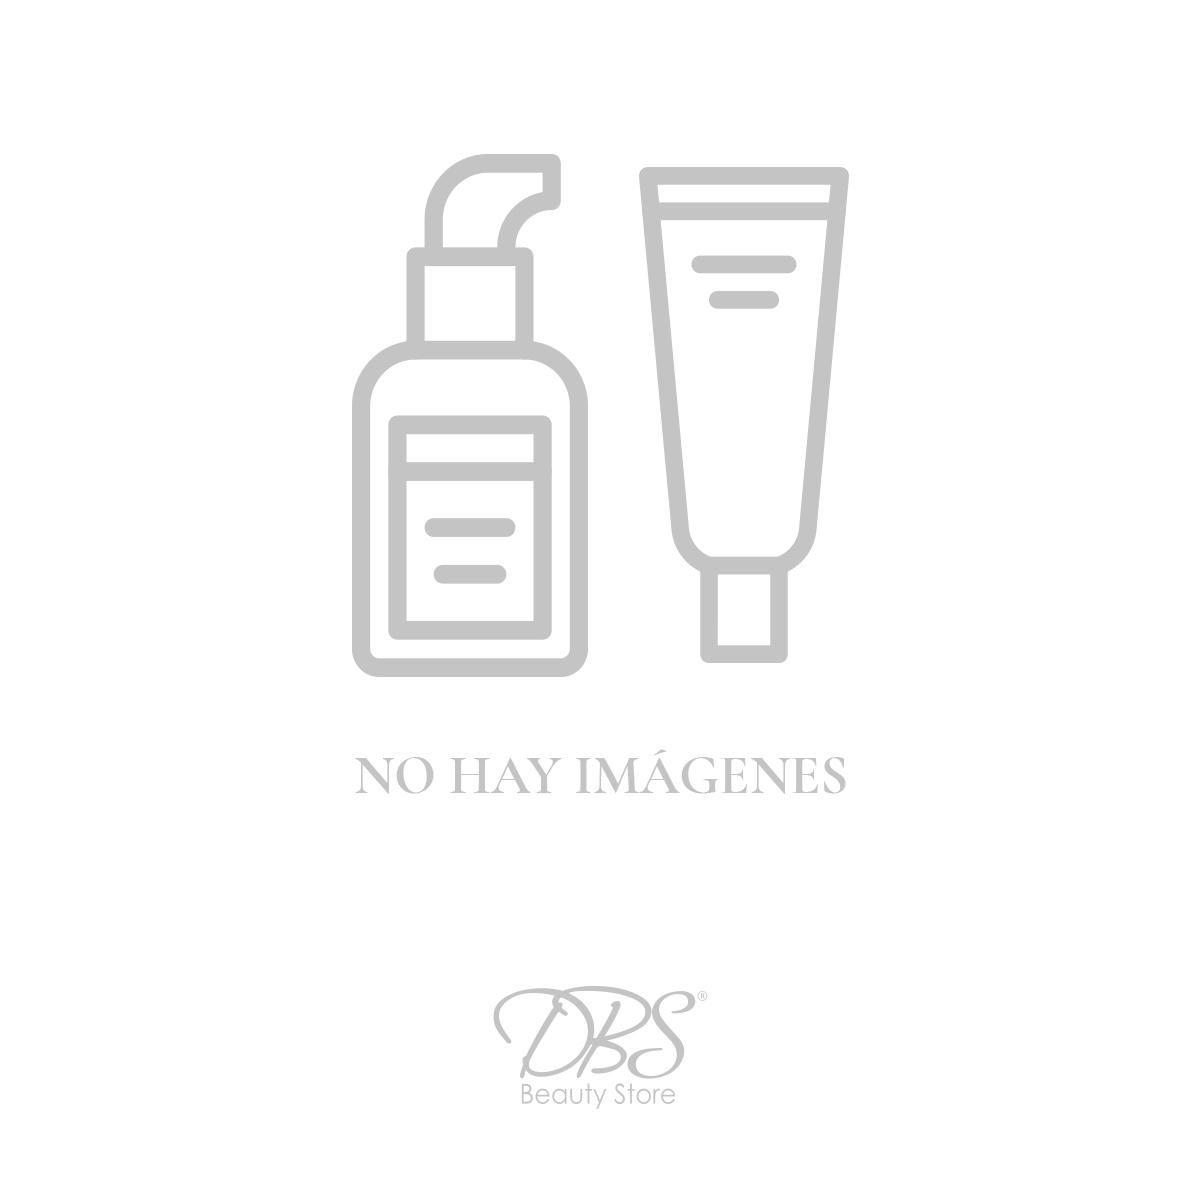 Shampoo Granada Y Pachili 280 Ml